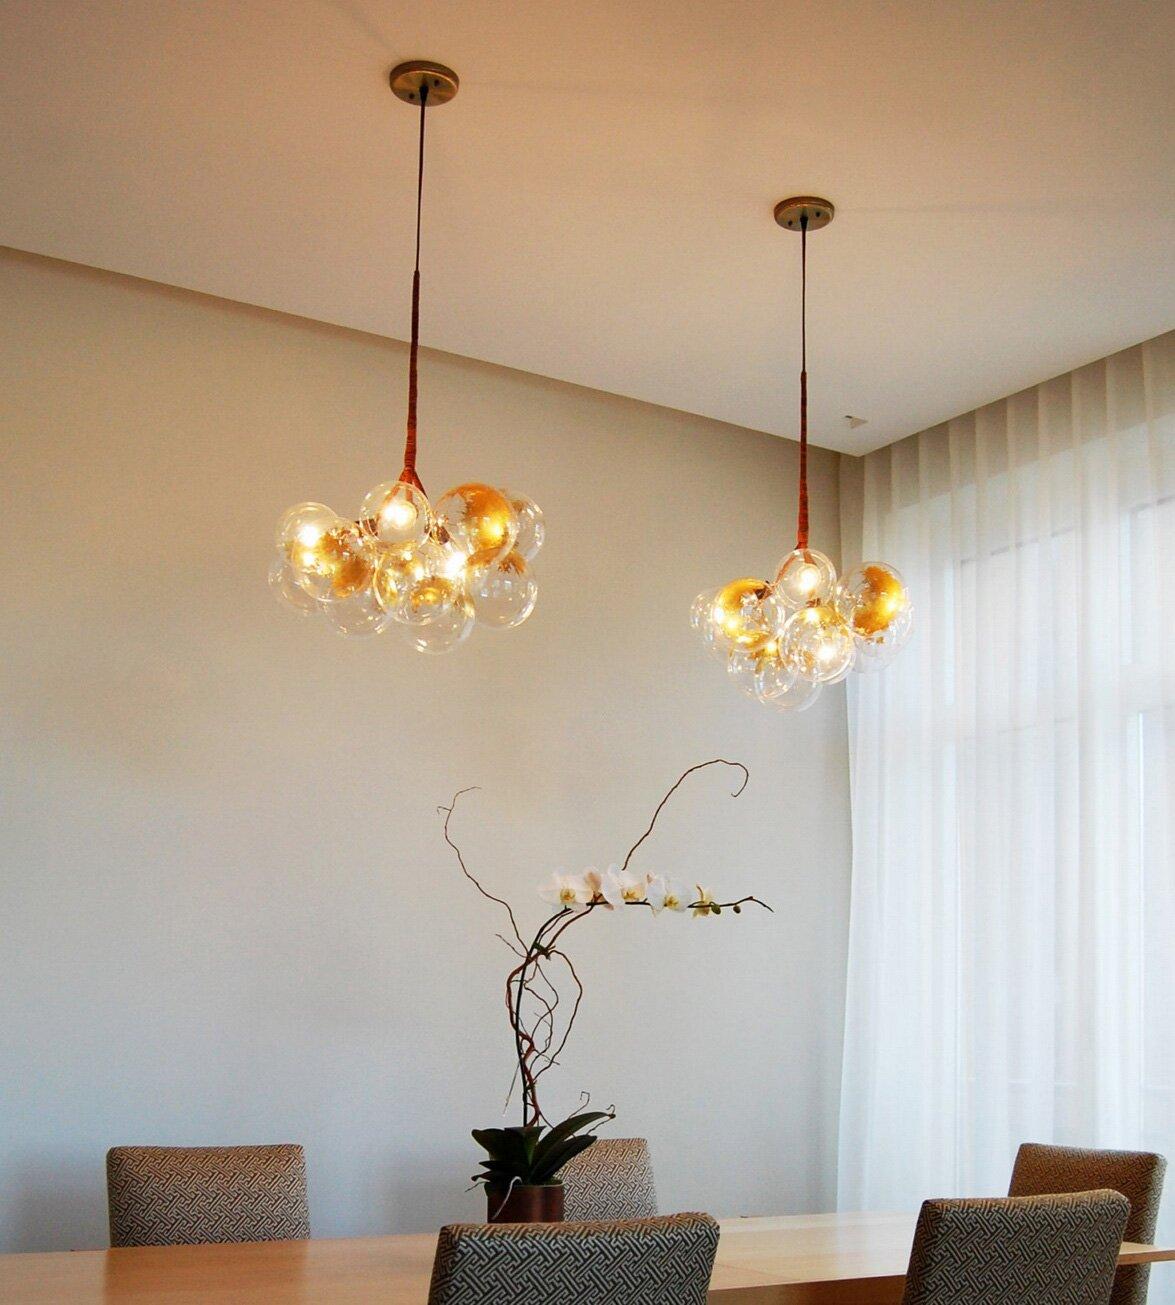 Beautiful Pictures Of Chandeliers interiorbeautiful glamour modern chandelier design idea attractive hanging chandelier ideas Most Beautiful Chandeliers 13